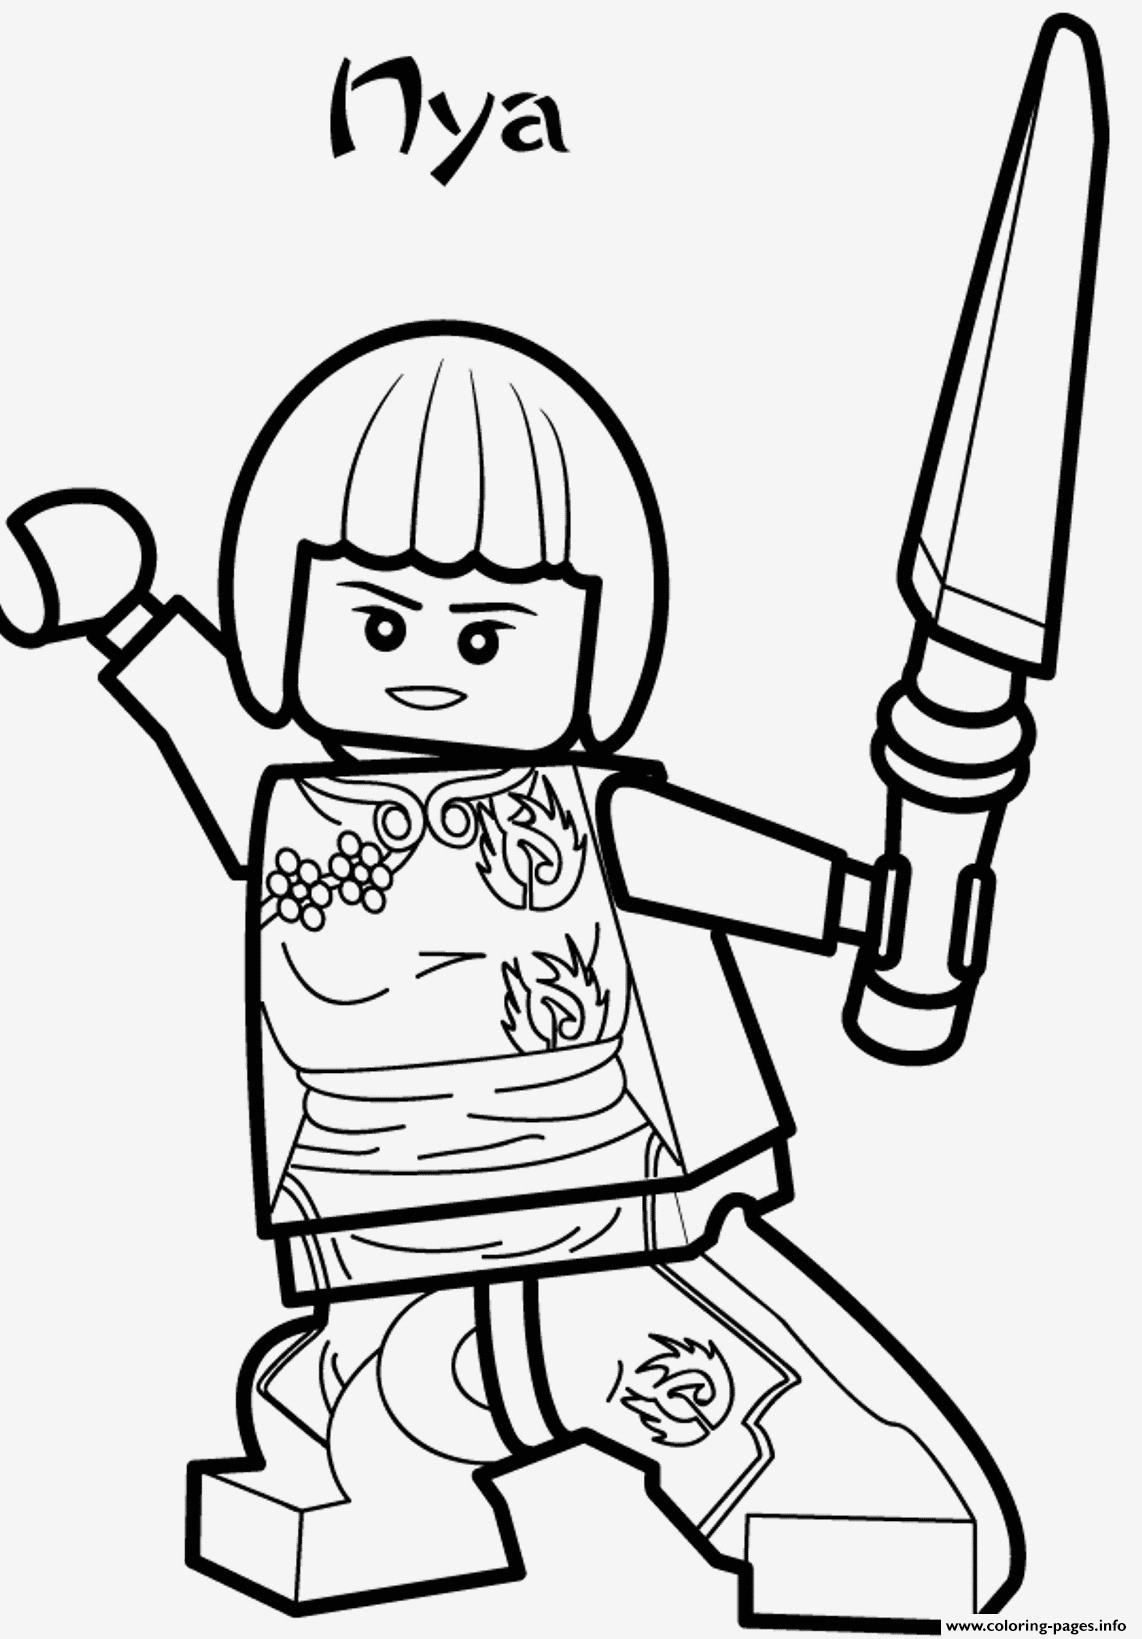 Lego Ninjago Zum Ausmalen Inspirierend Lego Ninjago Ausmalbild Bilder Zum Ausmalen Bekommen Ninjago Jay Bild